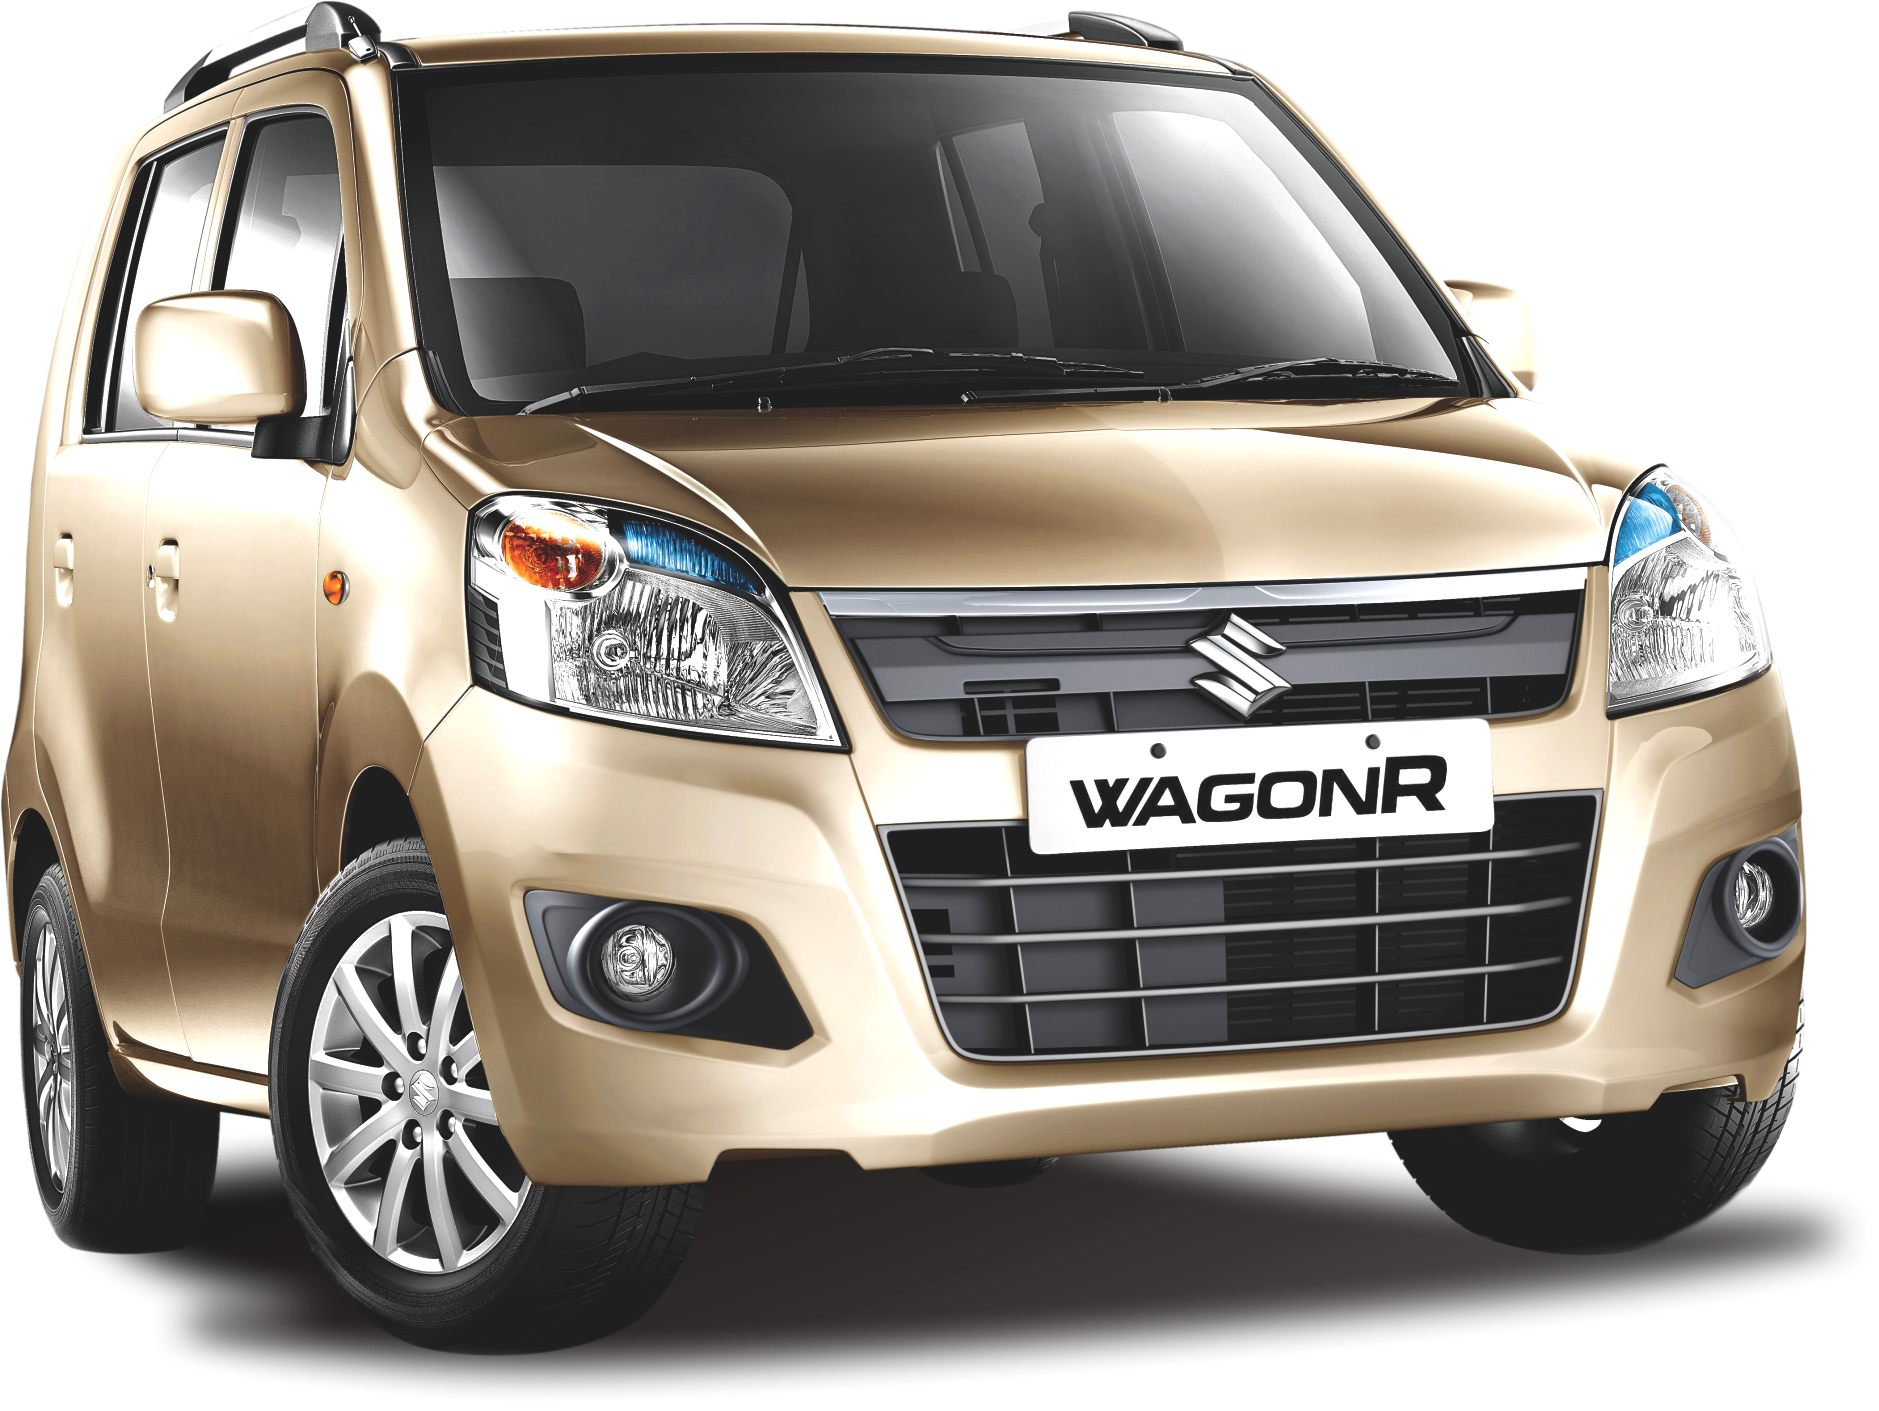 WangorR car transparent images free download